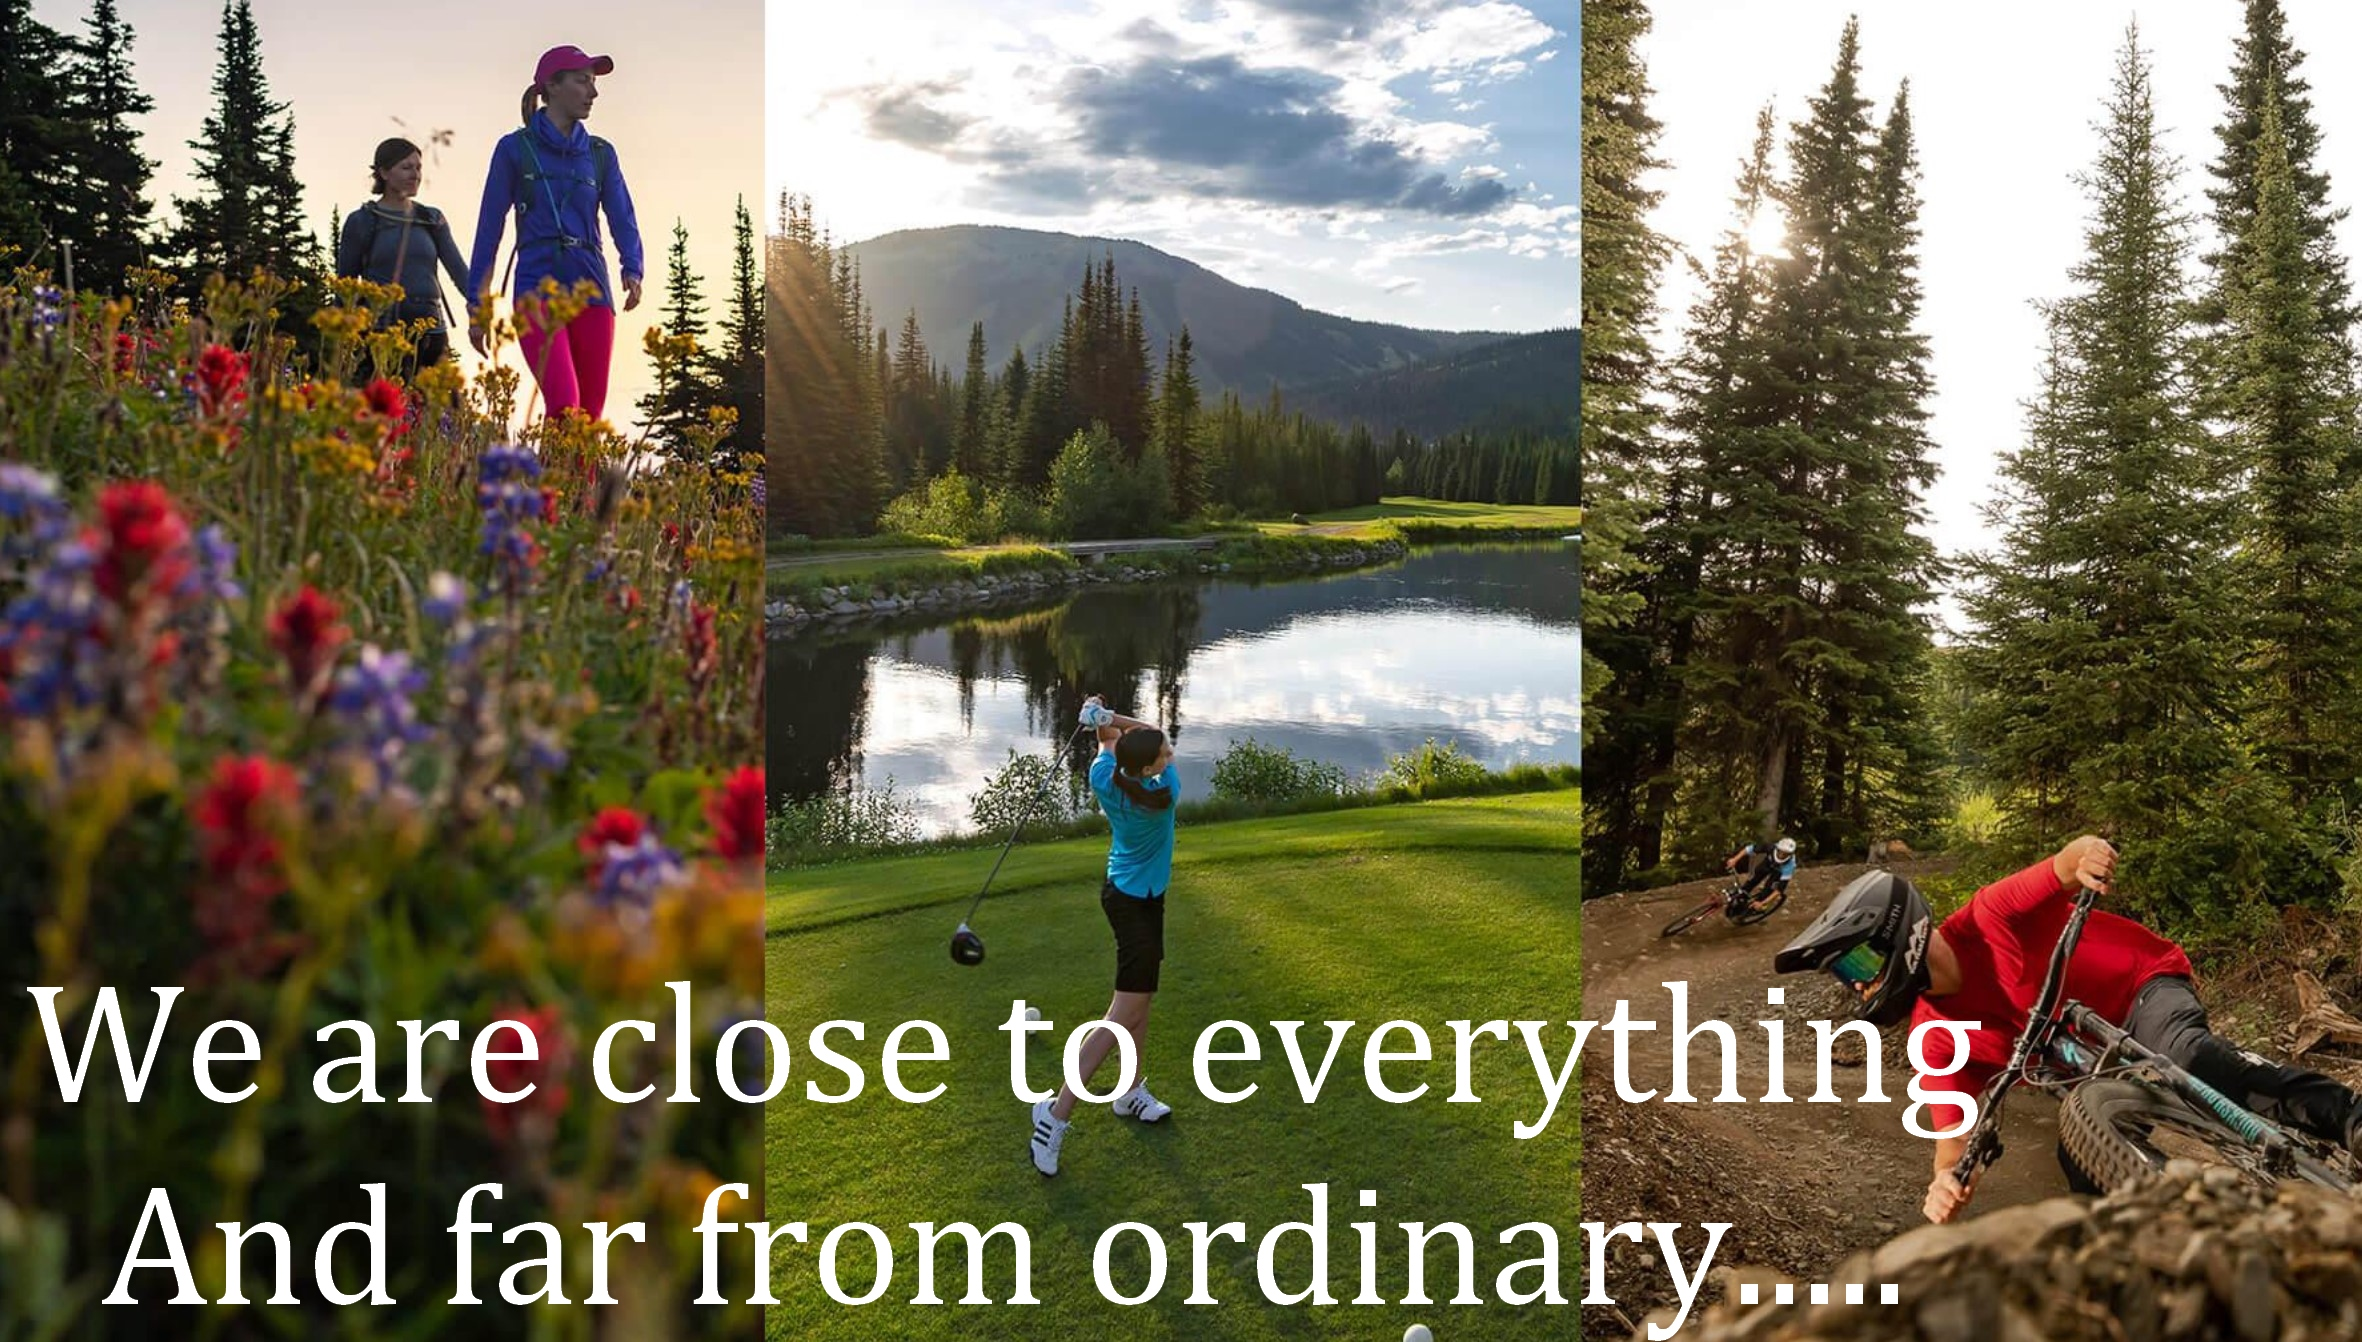 Far from ordinary Sun Peaks Vacation Rentals